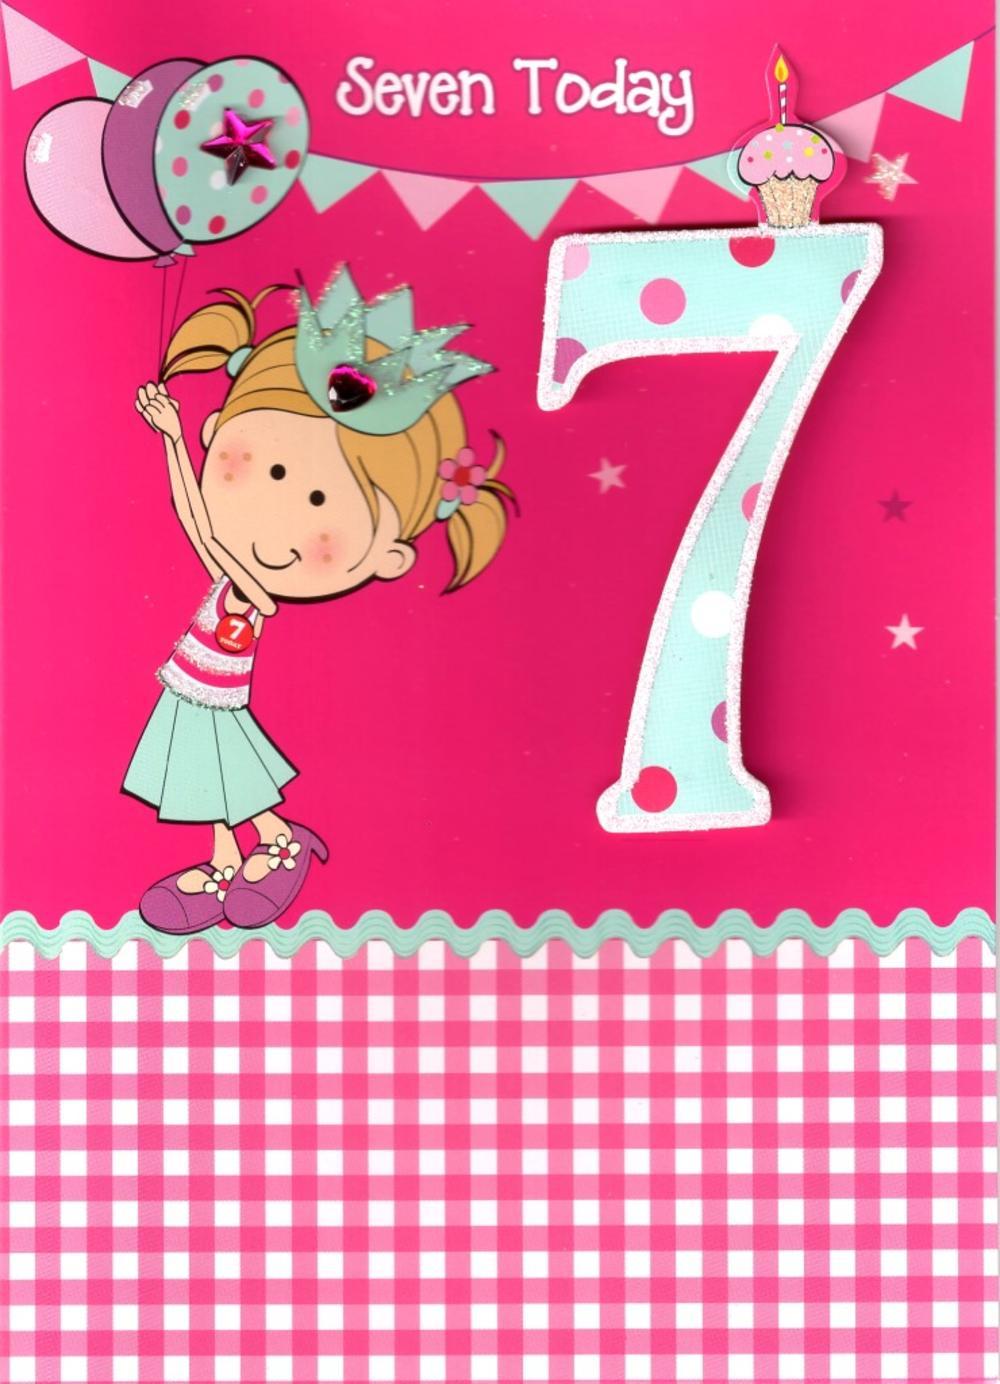 Girls 7th Birthday 7 Seven Today Card